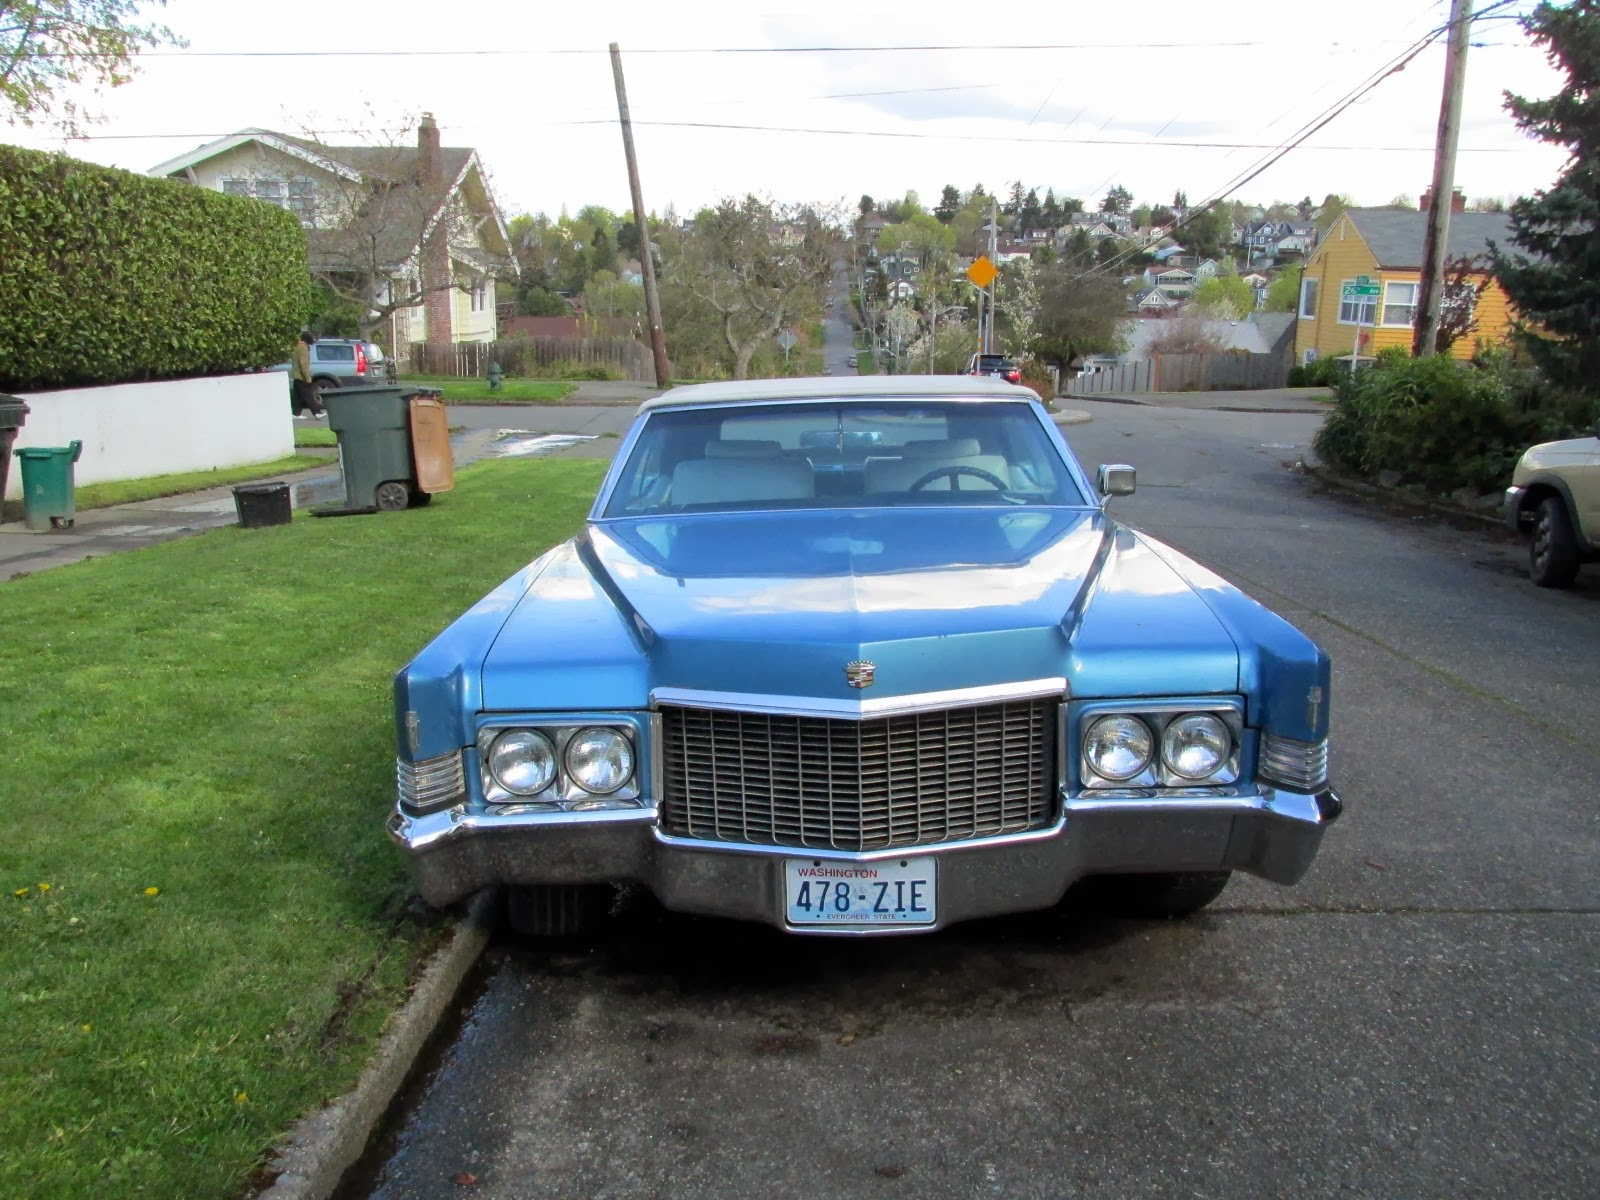 Seattle's Classics: 1970 Cadillac DeVille Convertible